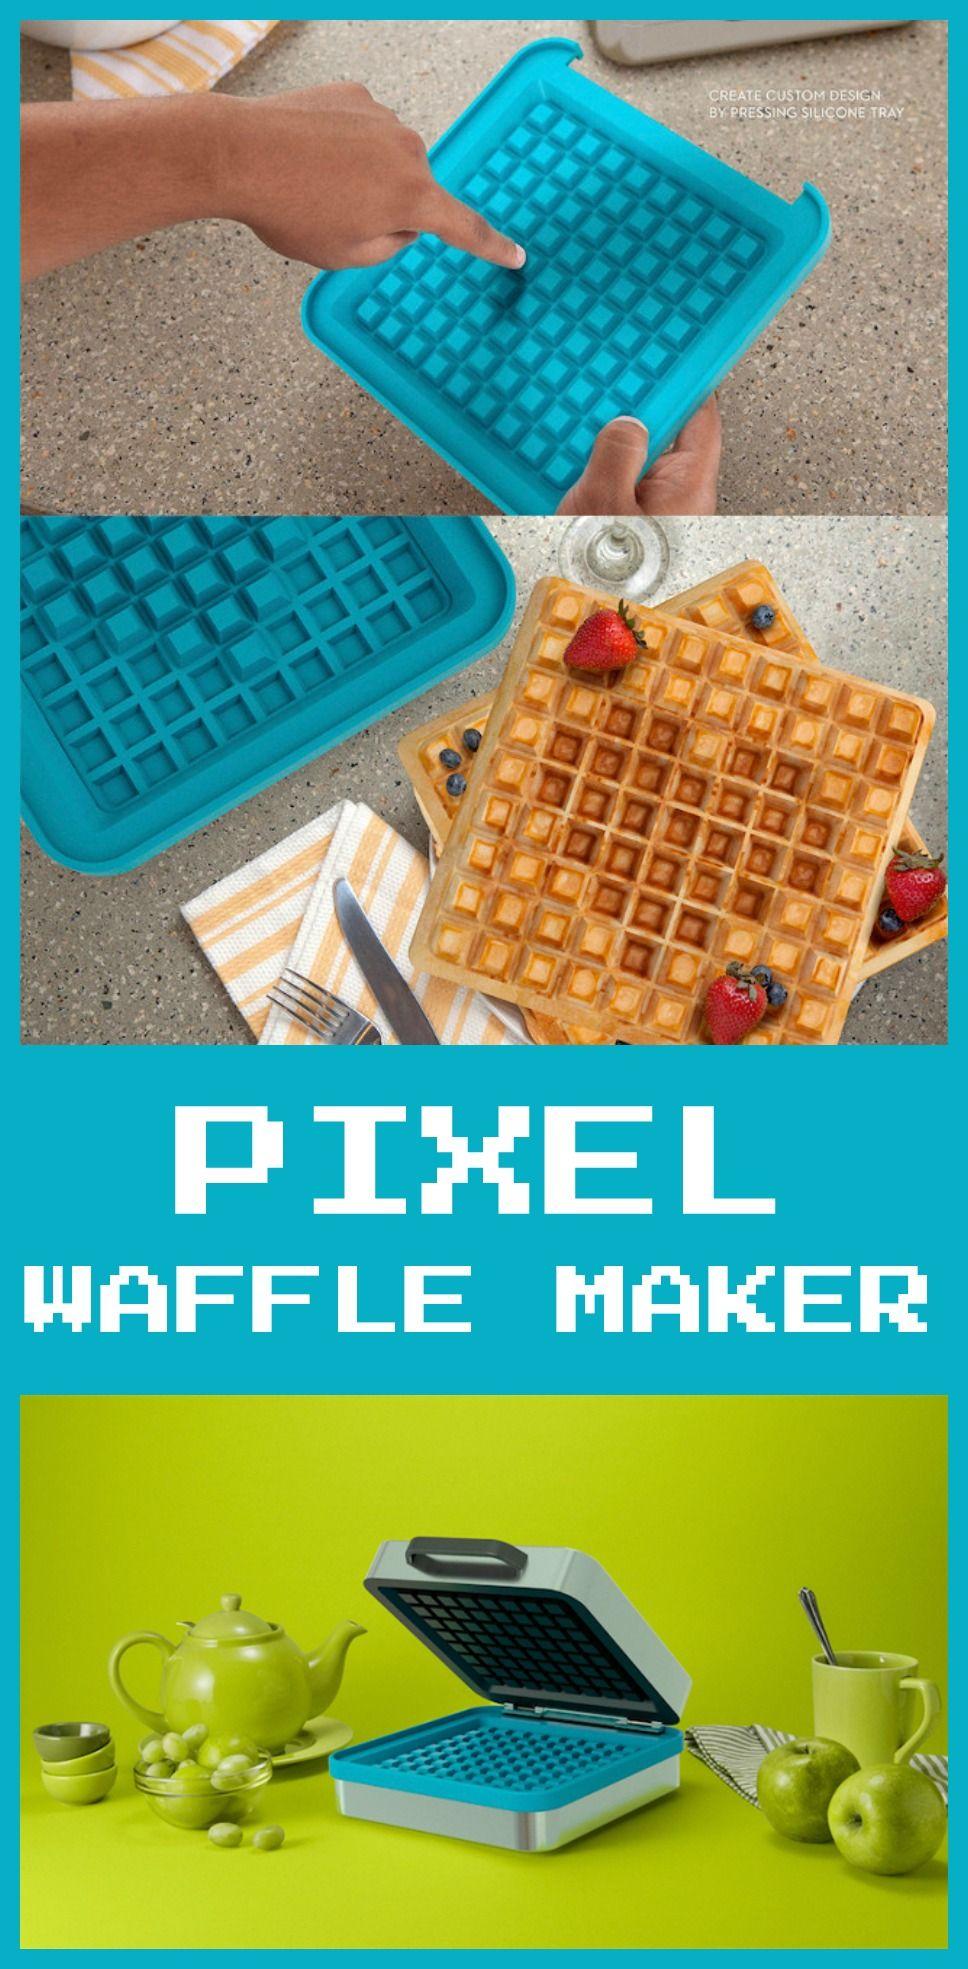 Pixel waffle maker | Fun Home Products | Pinterest | Waffles, Create ...